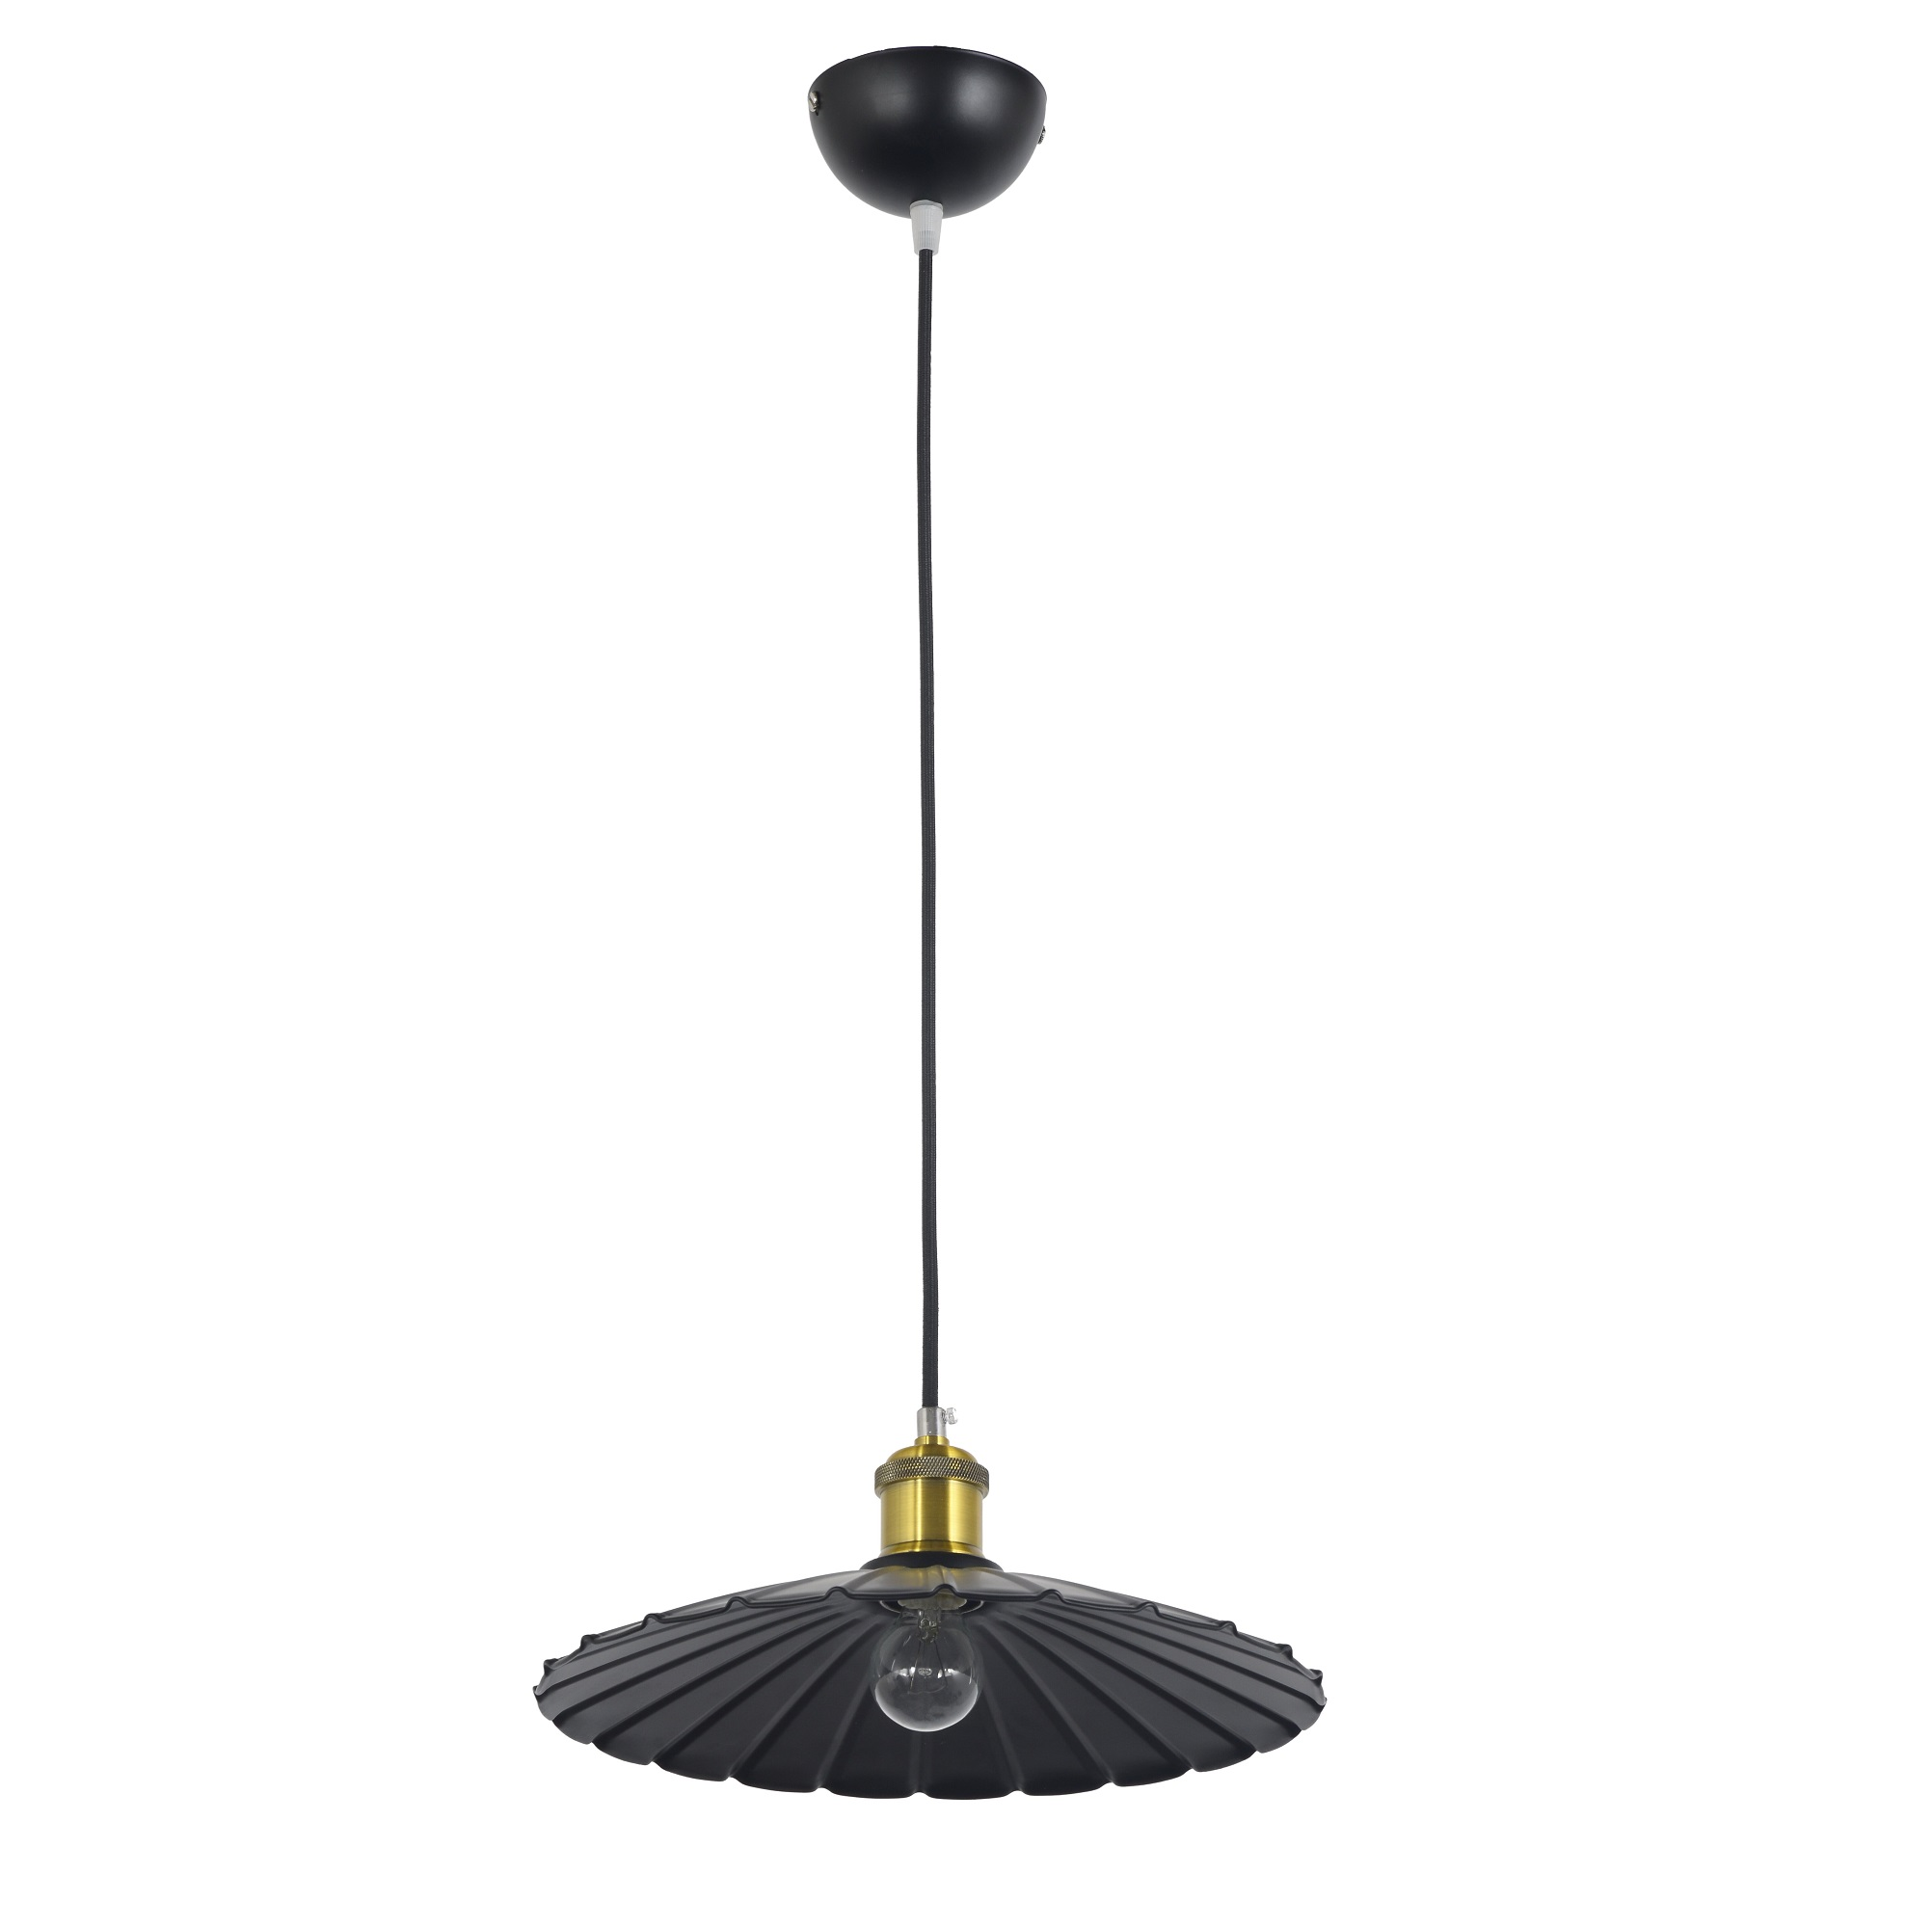 Подвесной светильник Arti Lampadari Marco E 1.3.P3 B